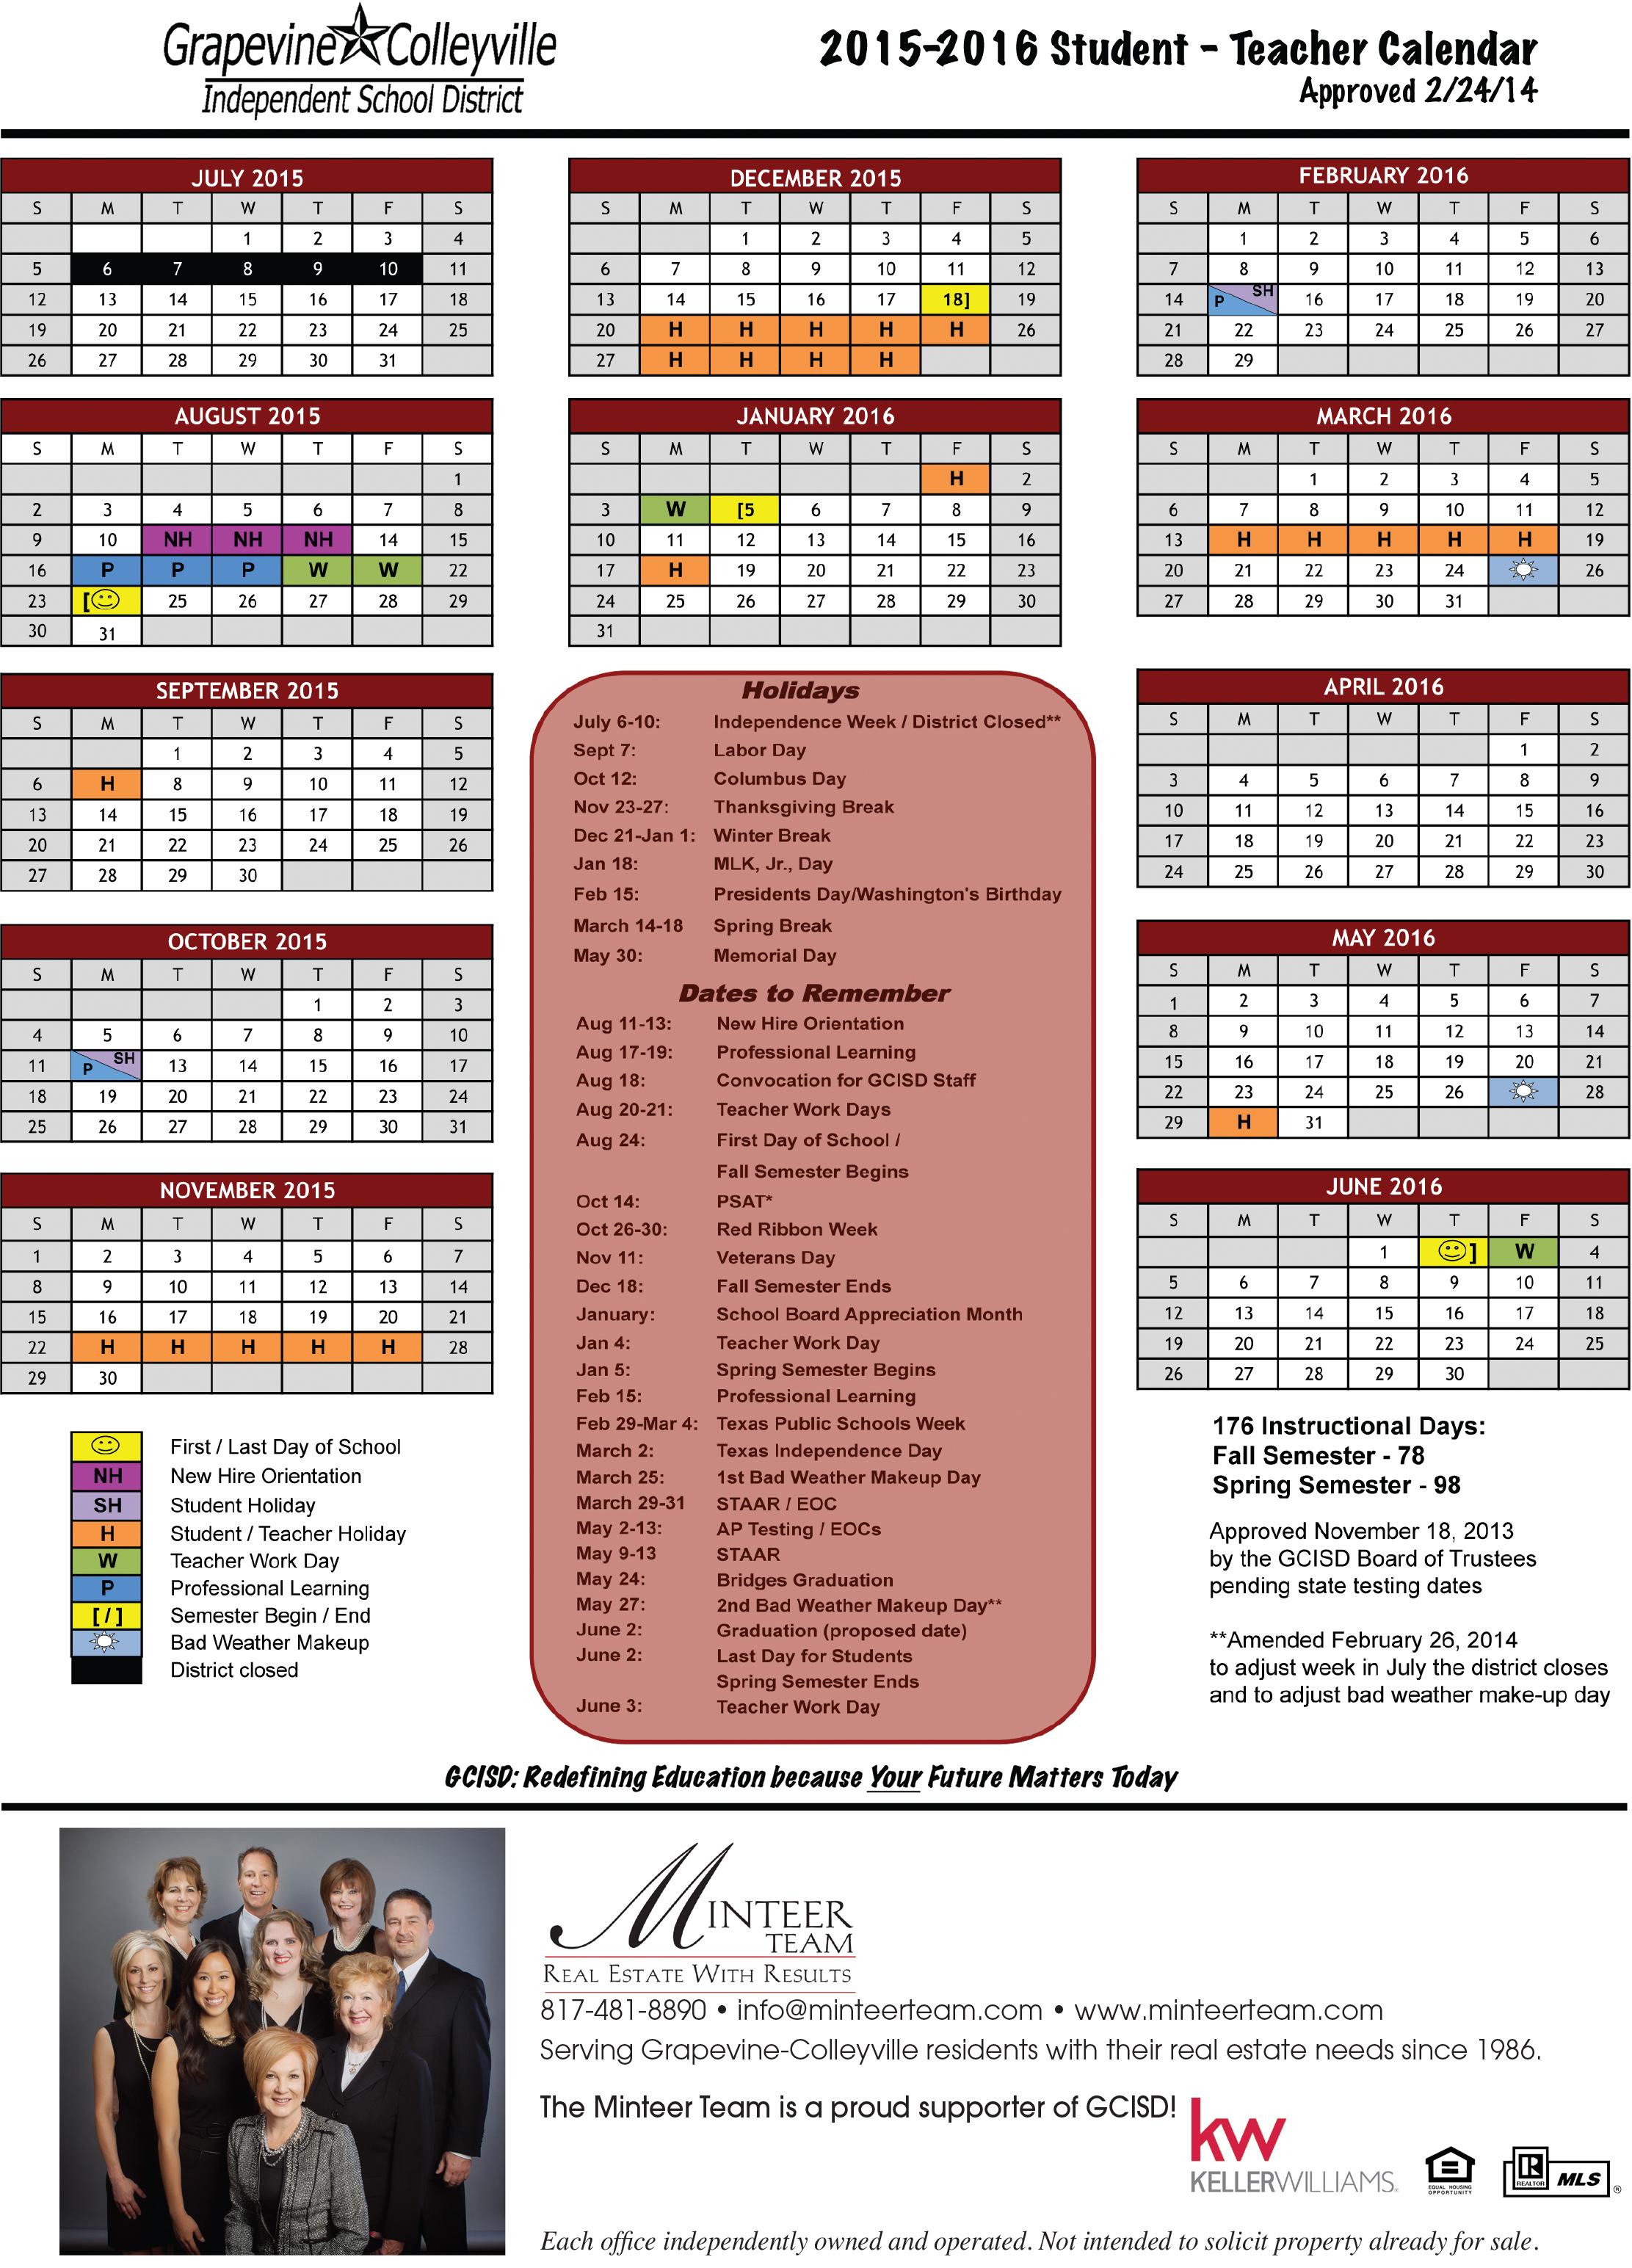 School Calendar For Gcisd (2015 2016) – Minteer Real Estate Team Within Fort Worth Isd Calendar